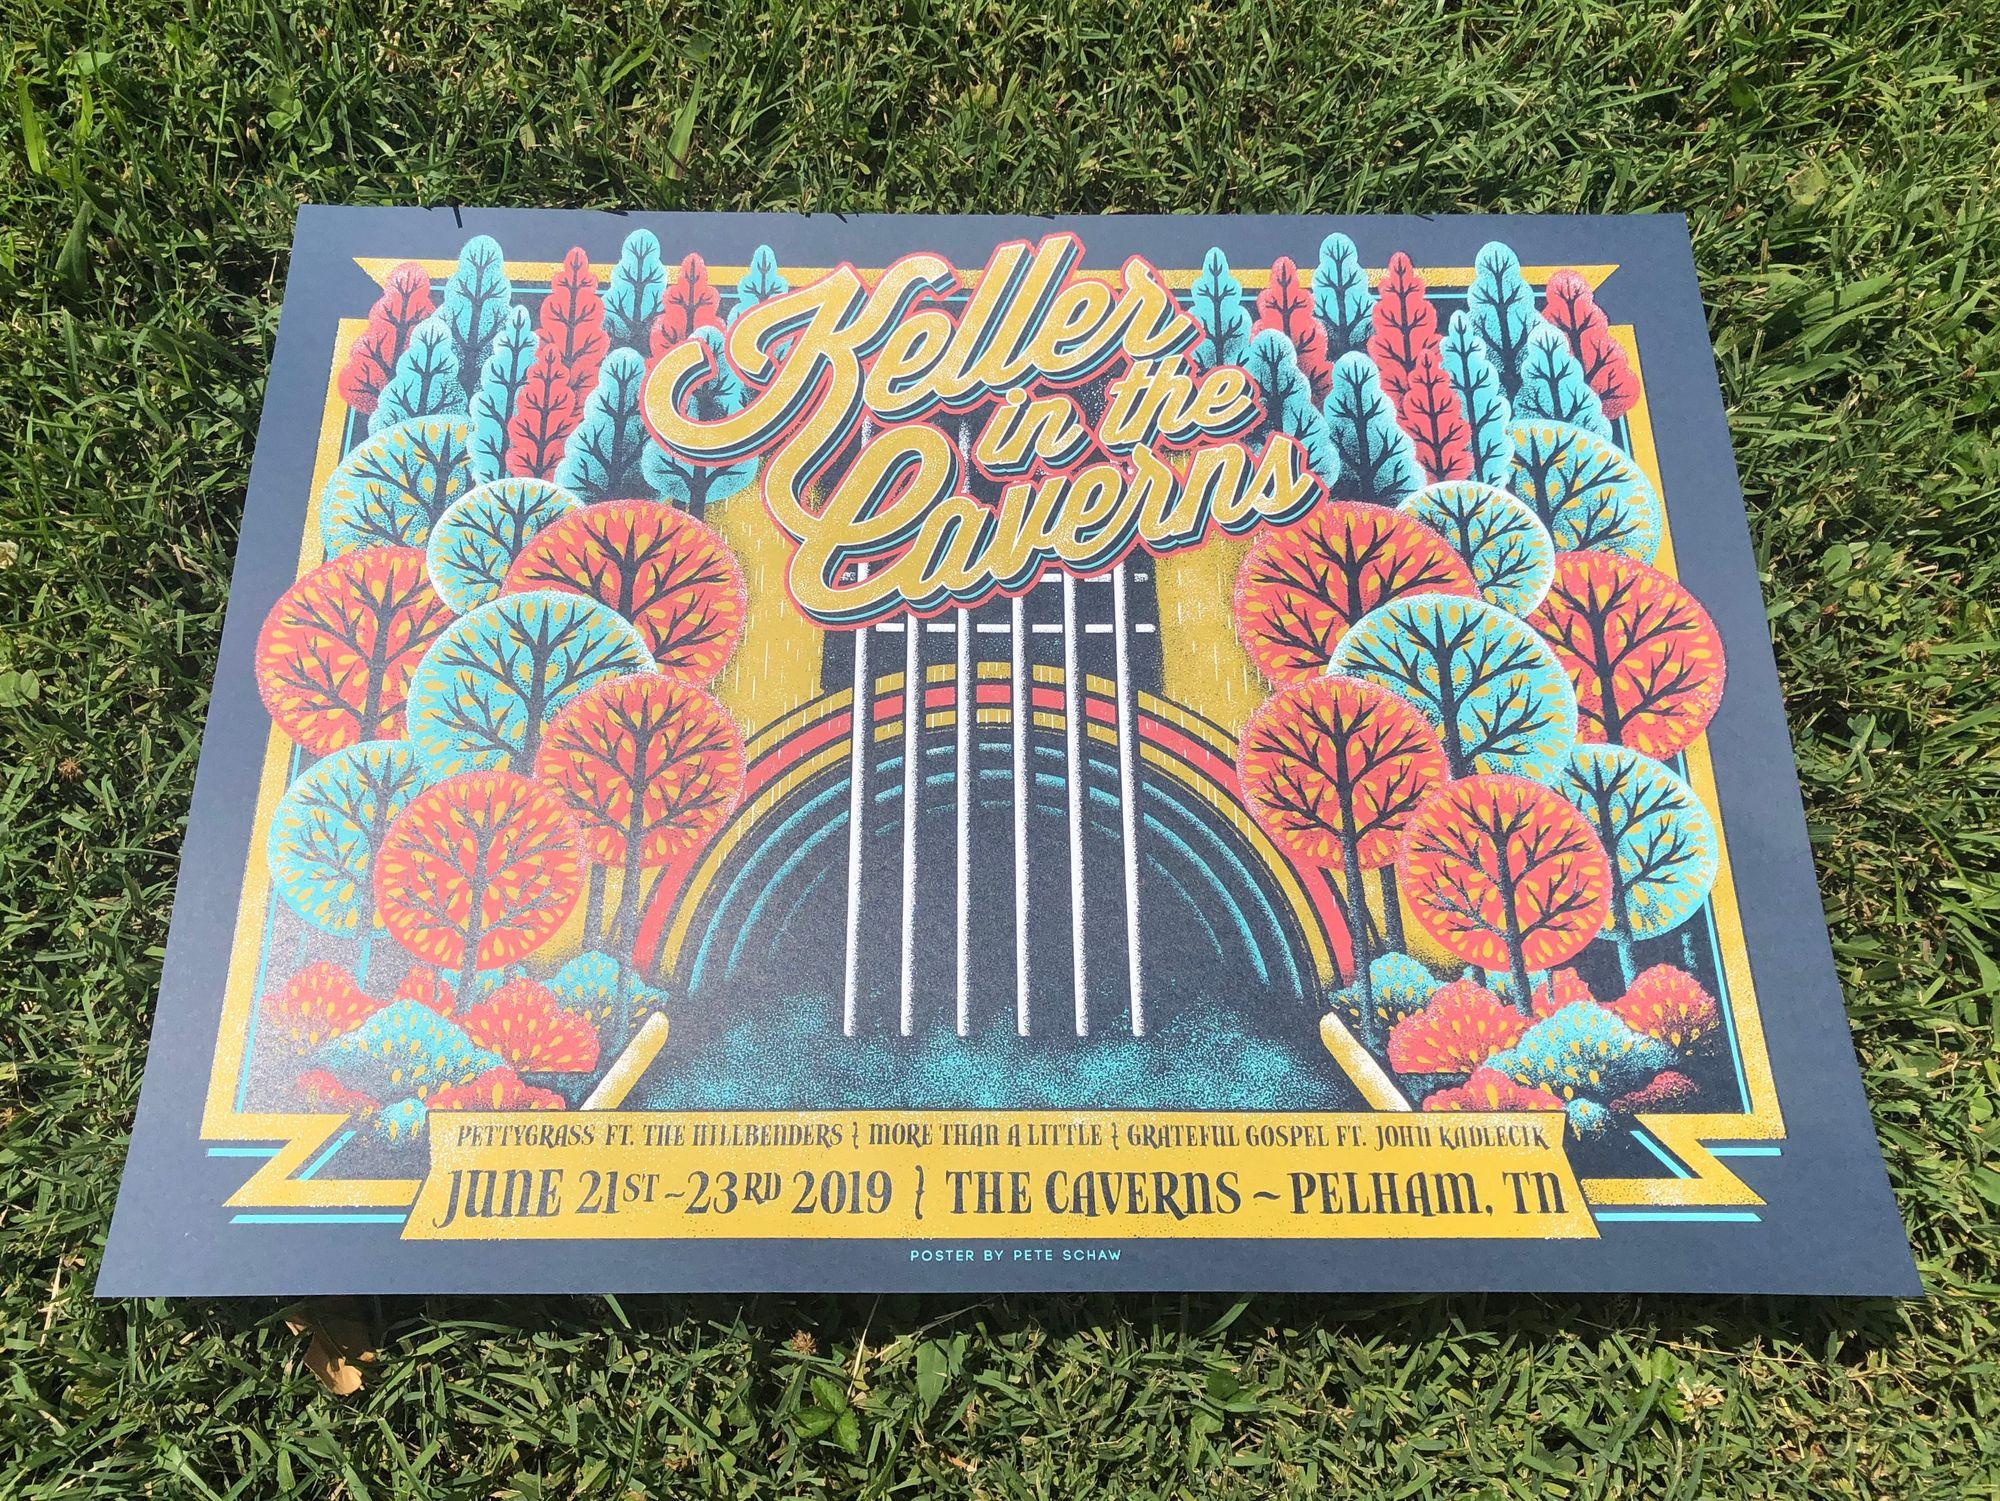 Keller Williams The Caverns 2019 poster.JPG